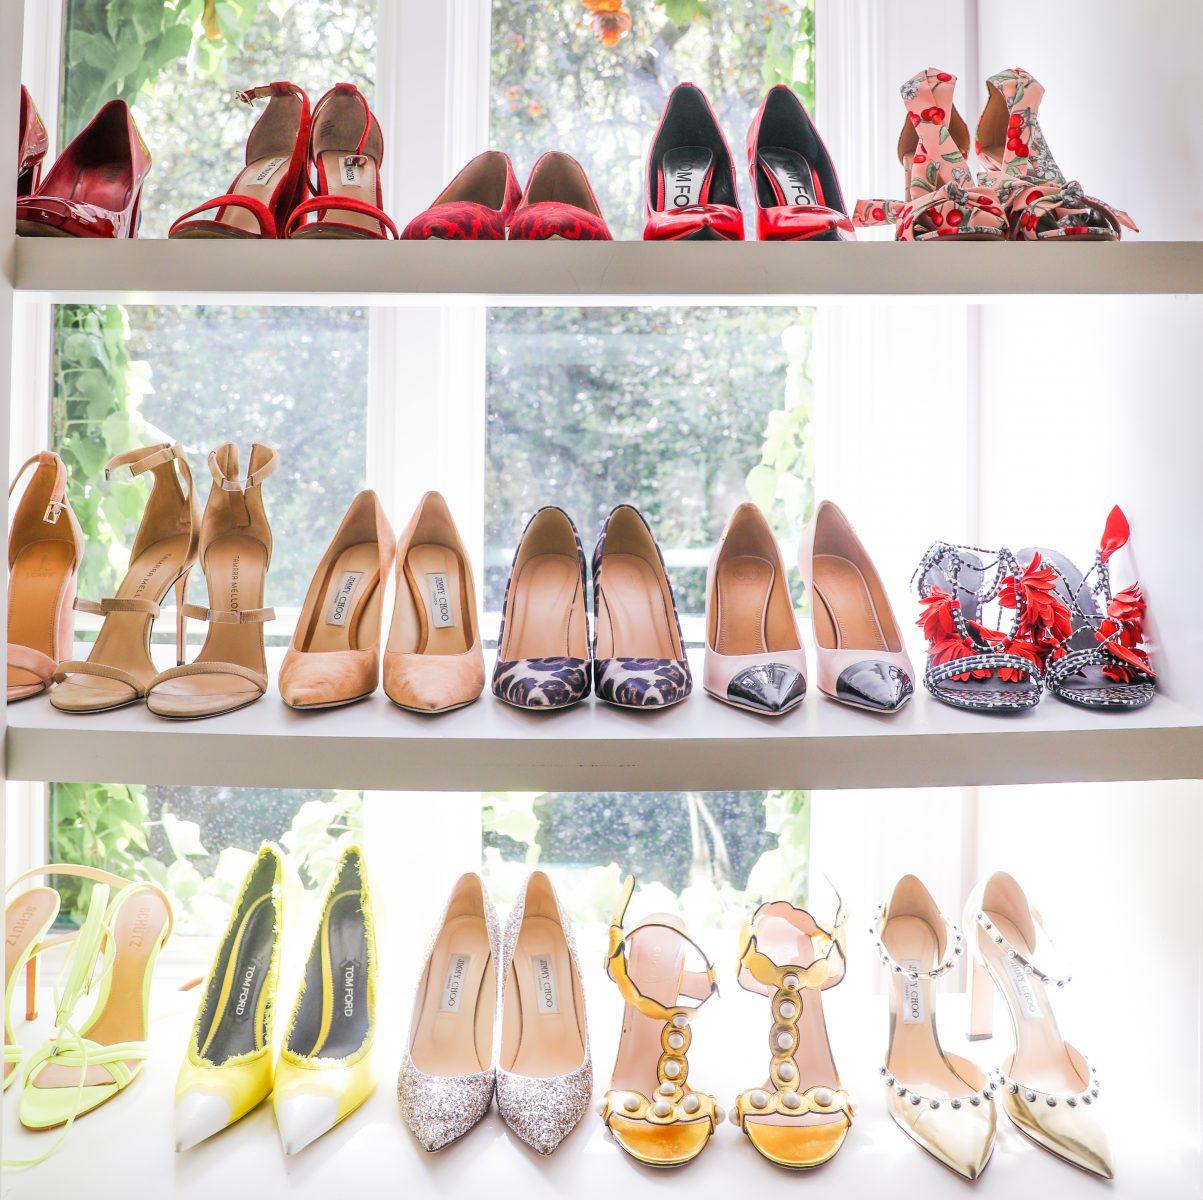 Color-coordinated vintage shoes